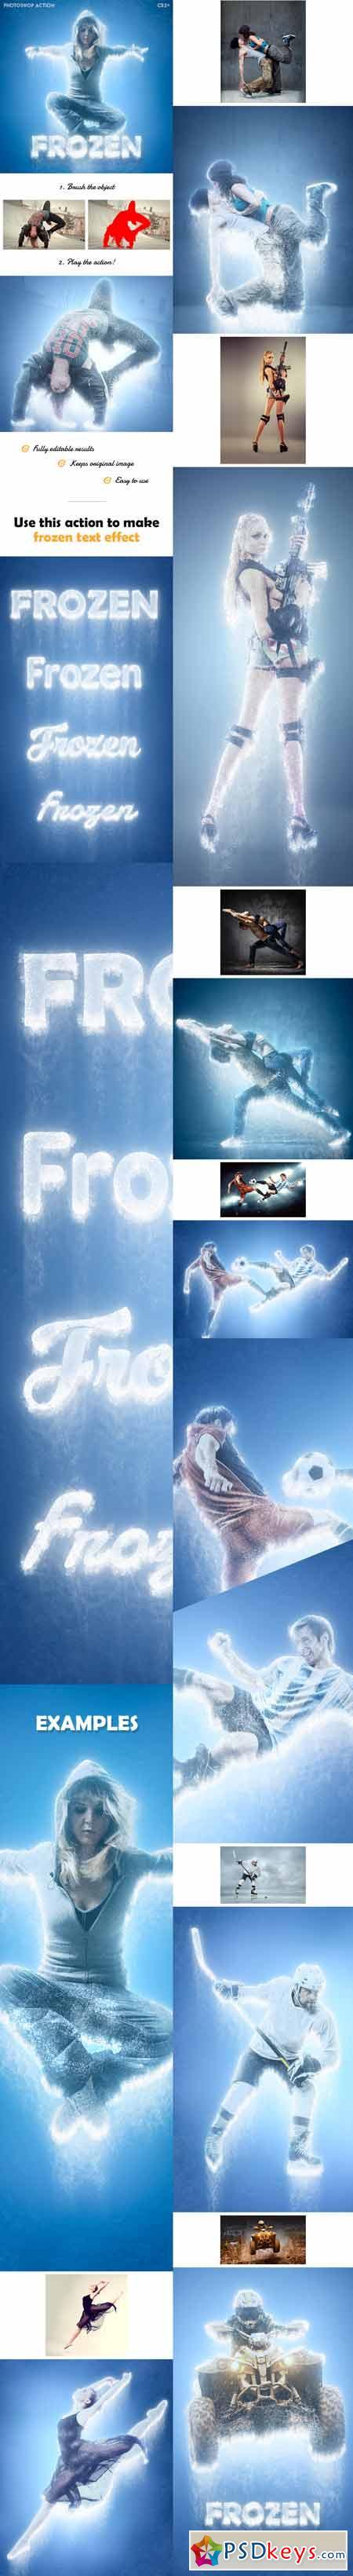 Frozen - Ice Photoshop action 13499885